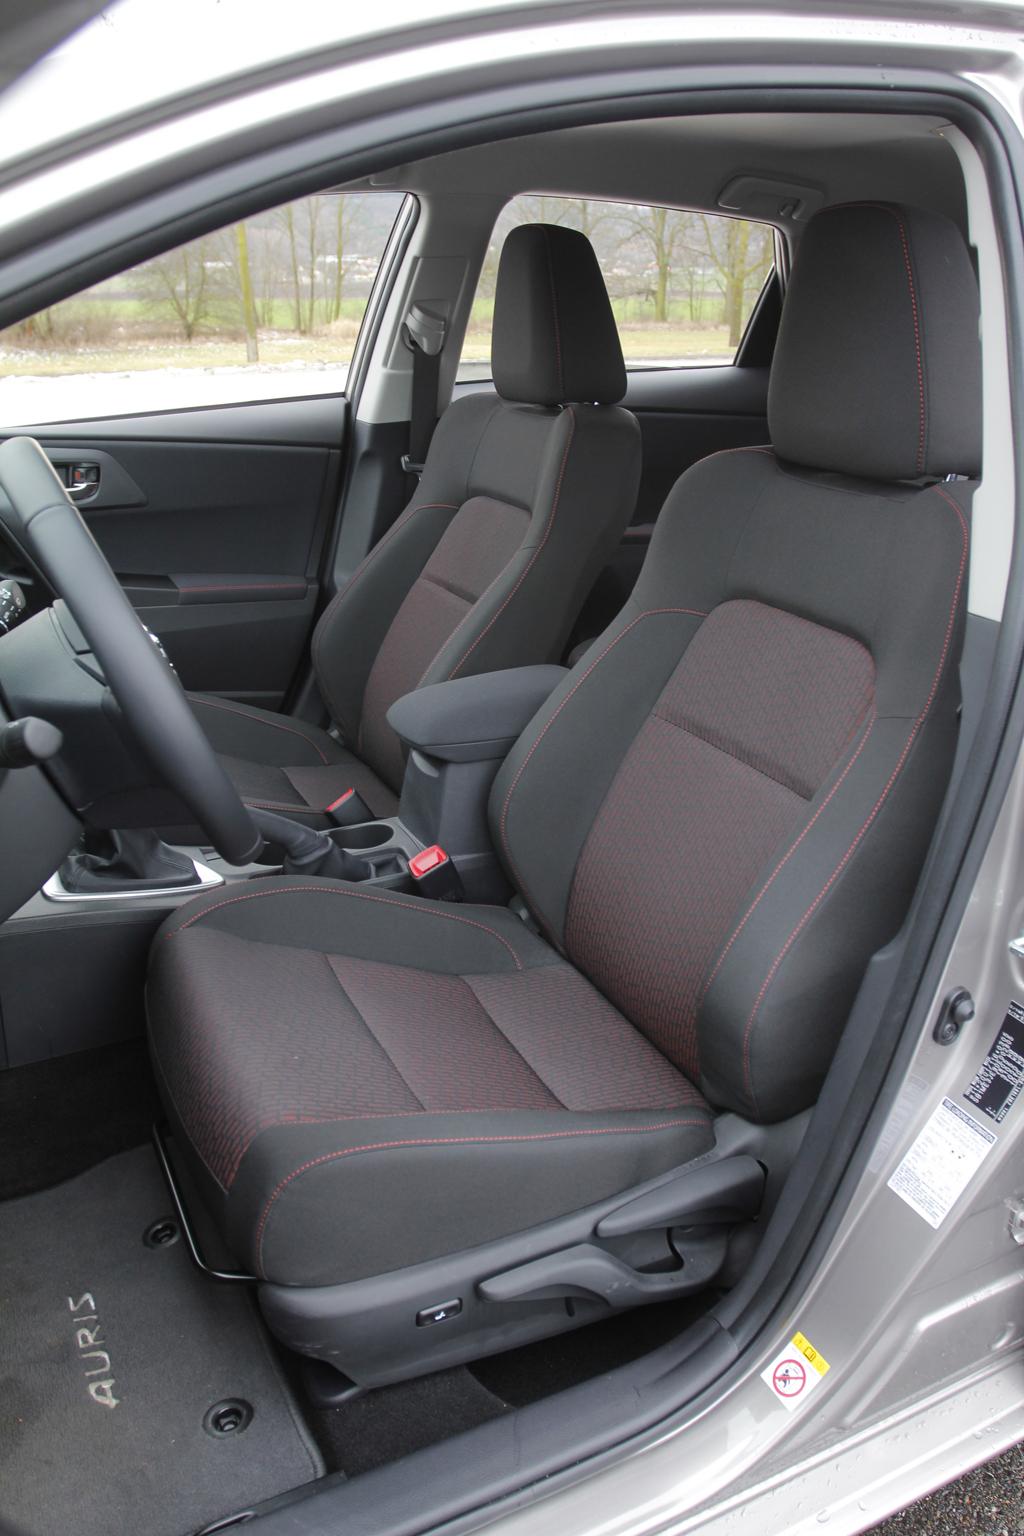 Automobily Toyota Auris 1.6 Valvematic Active